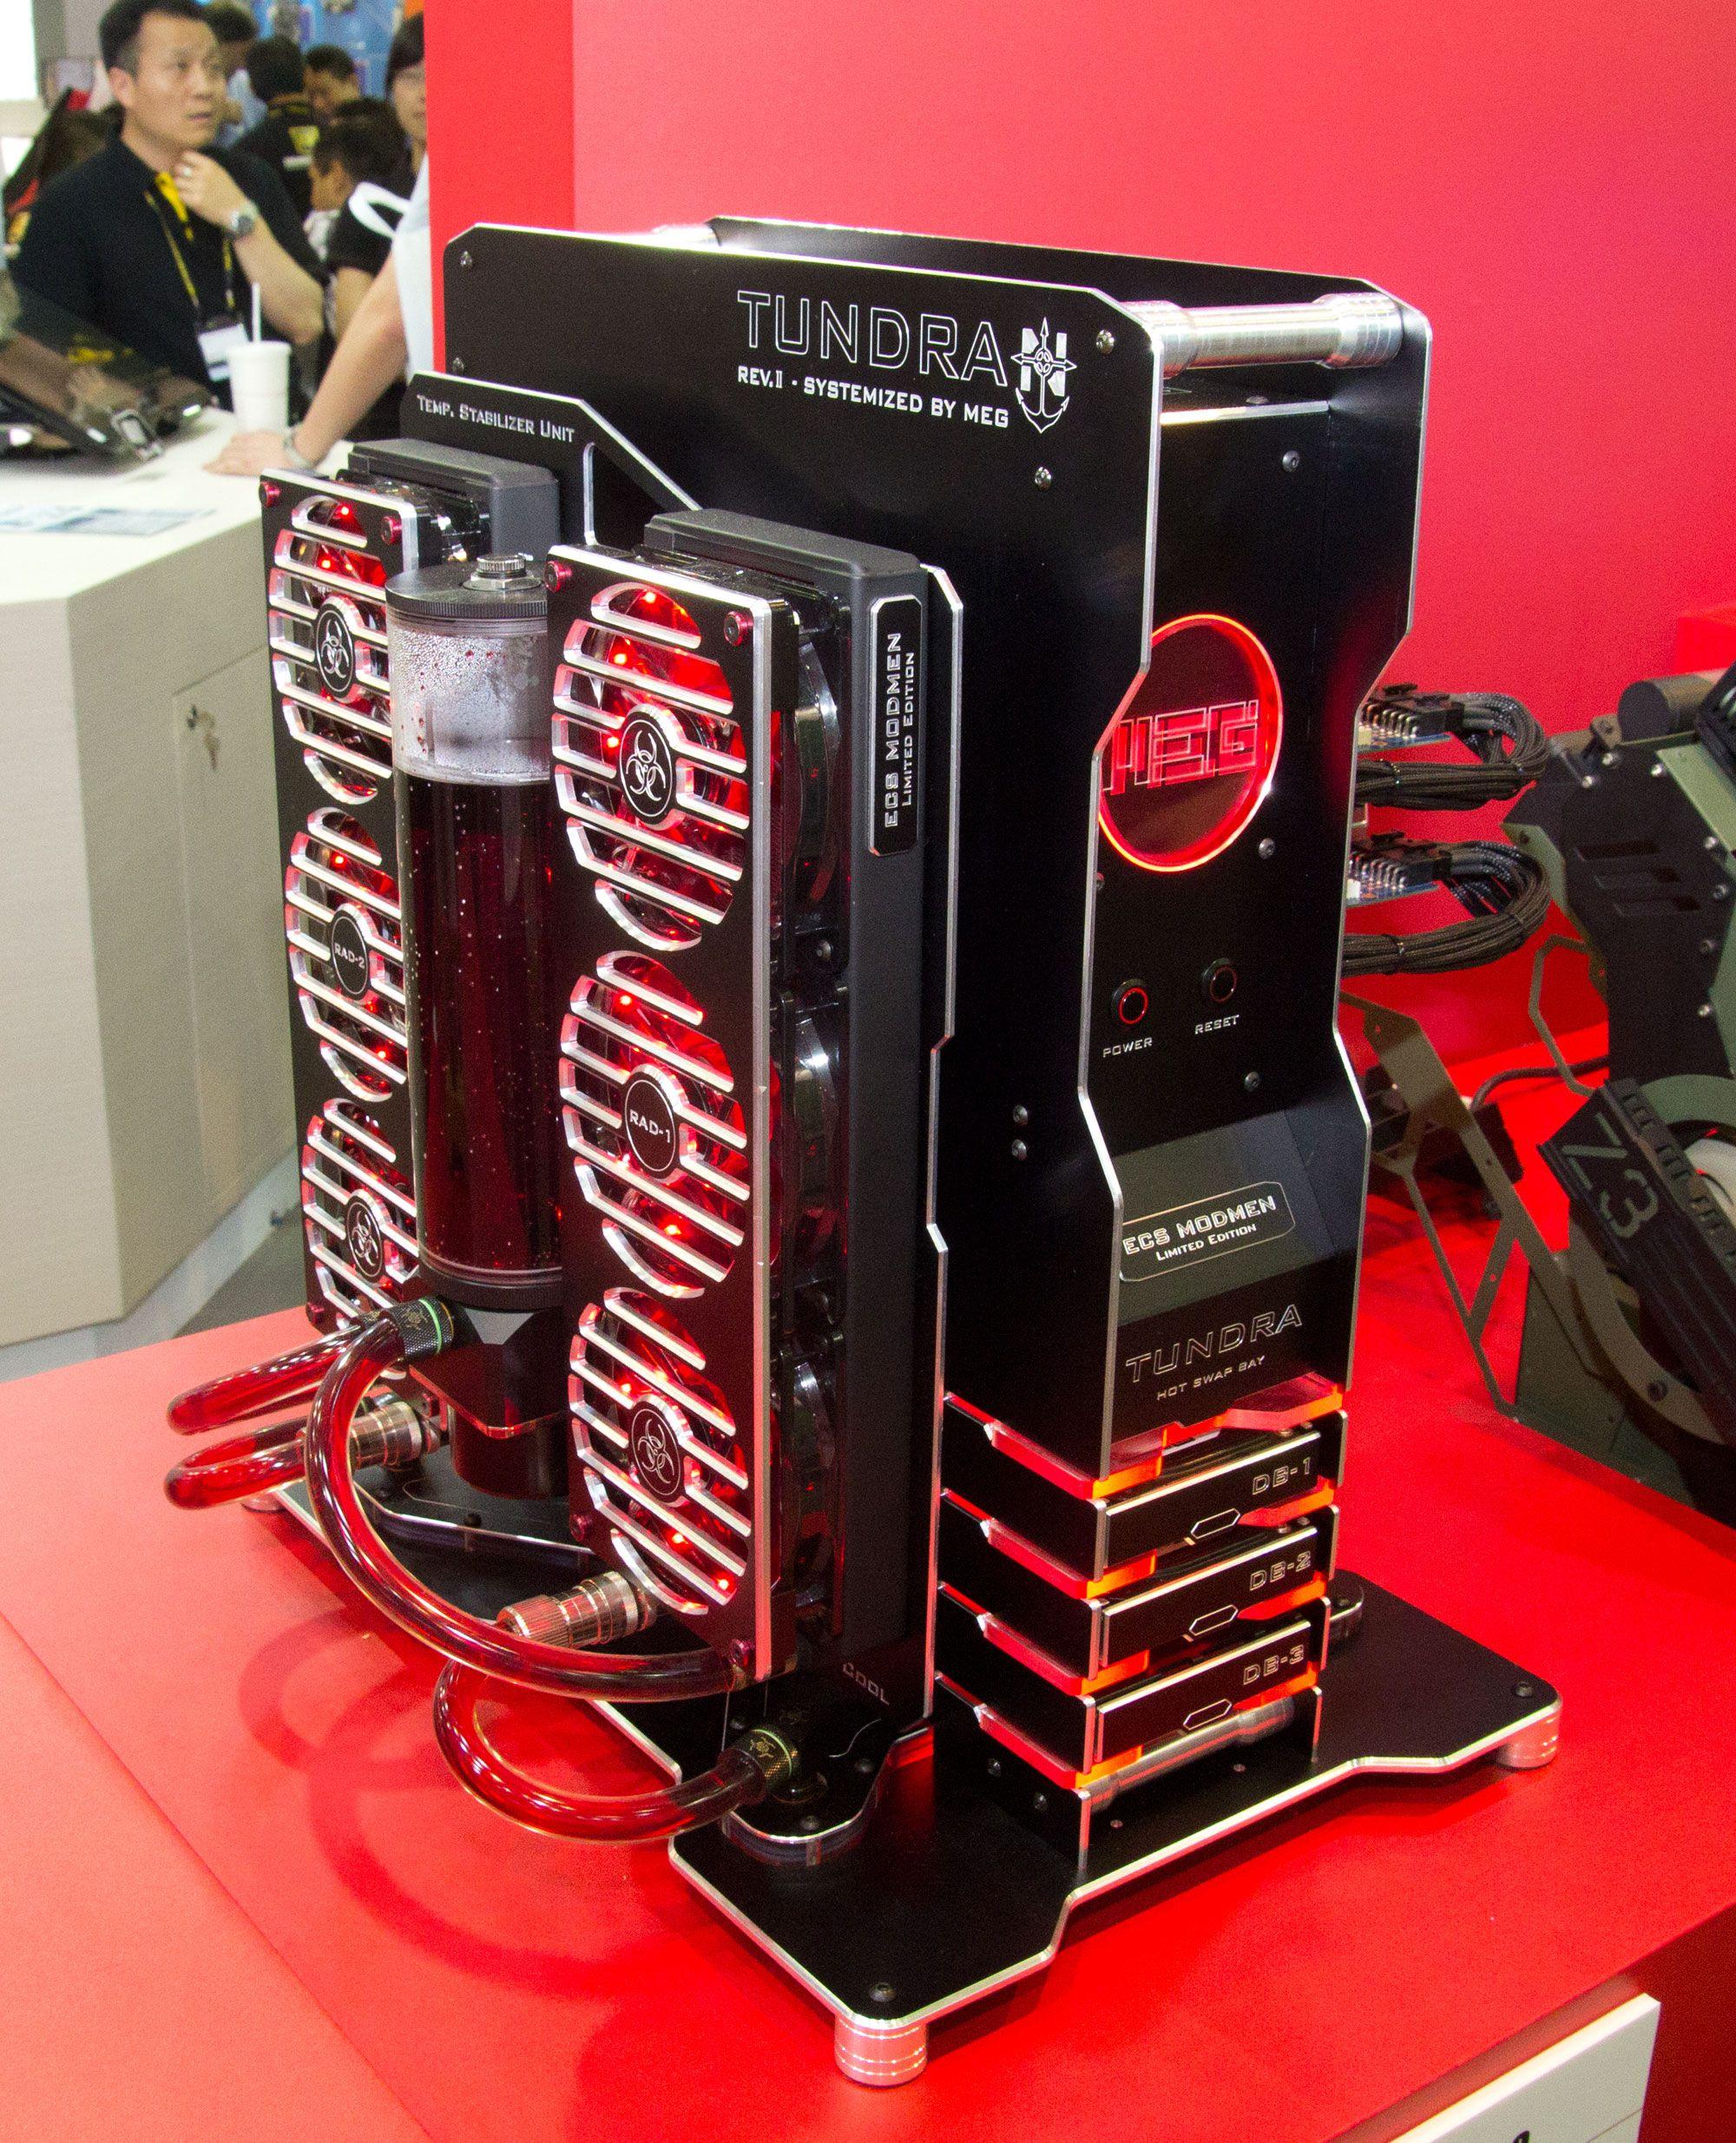 megkorea har laget maskinen «Tundra».